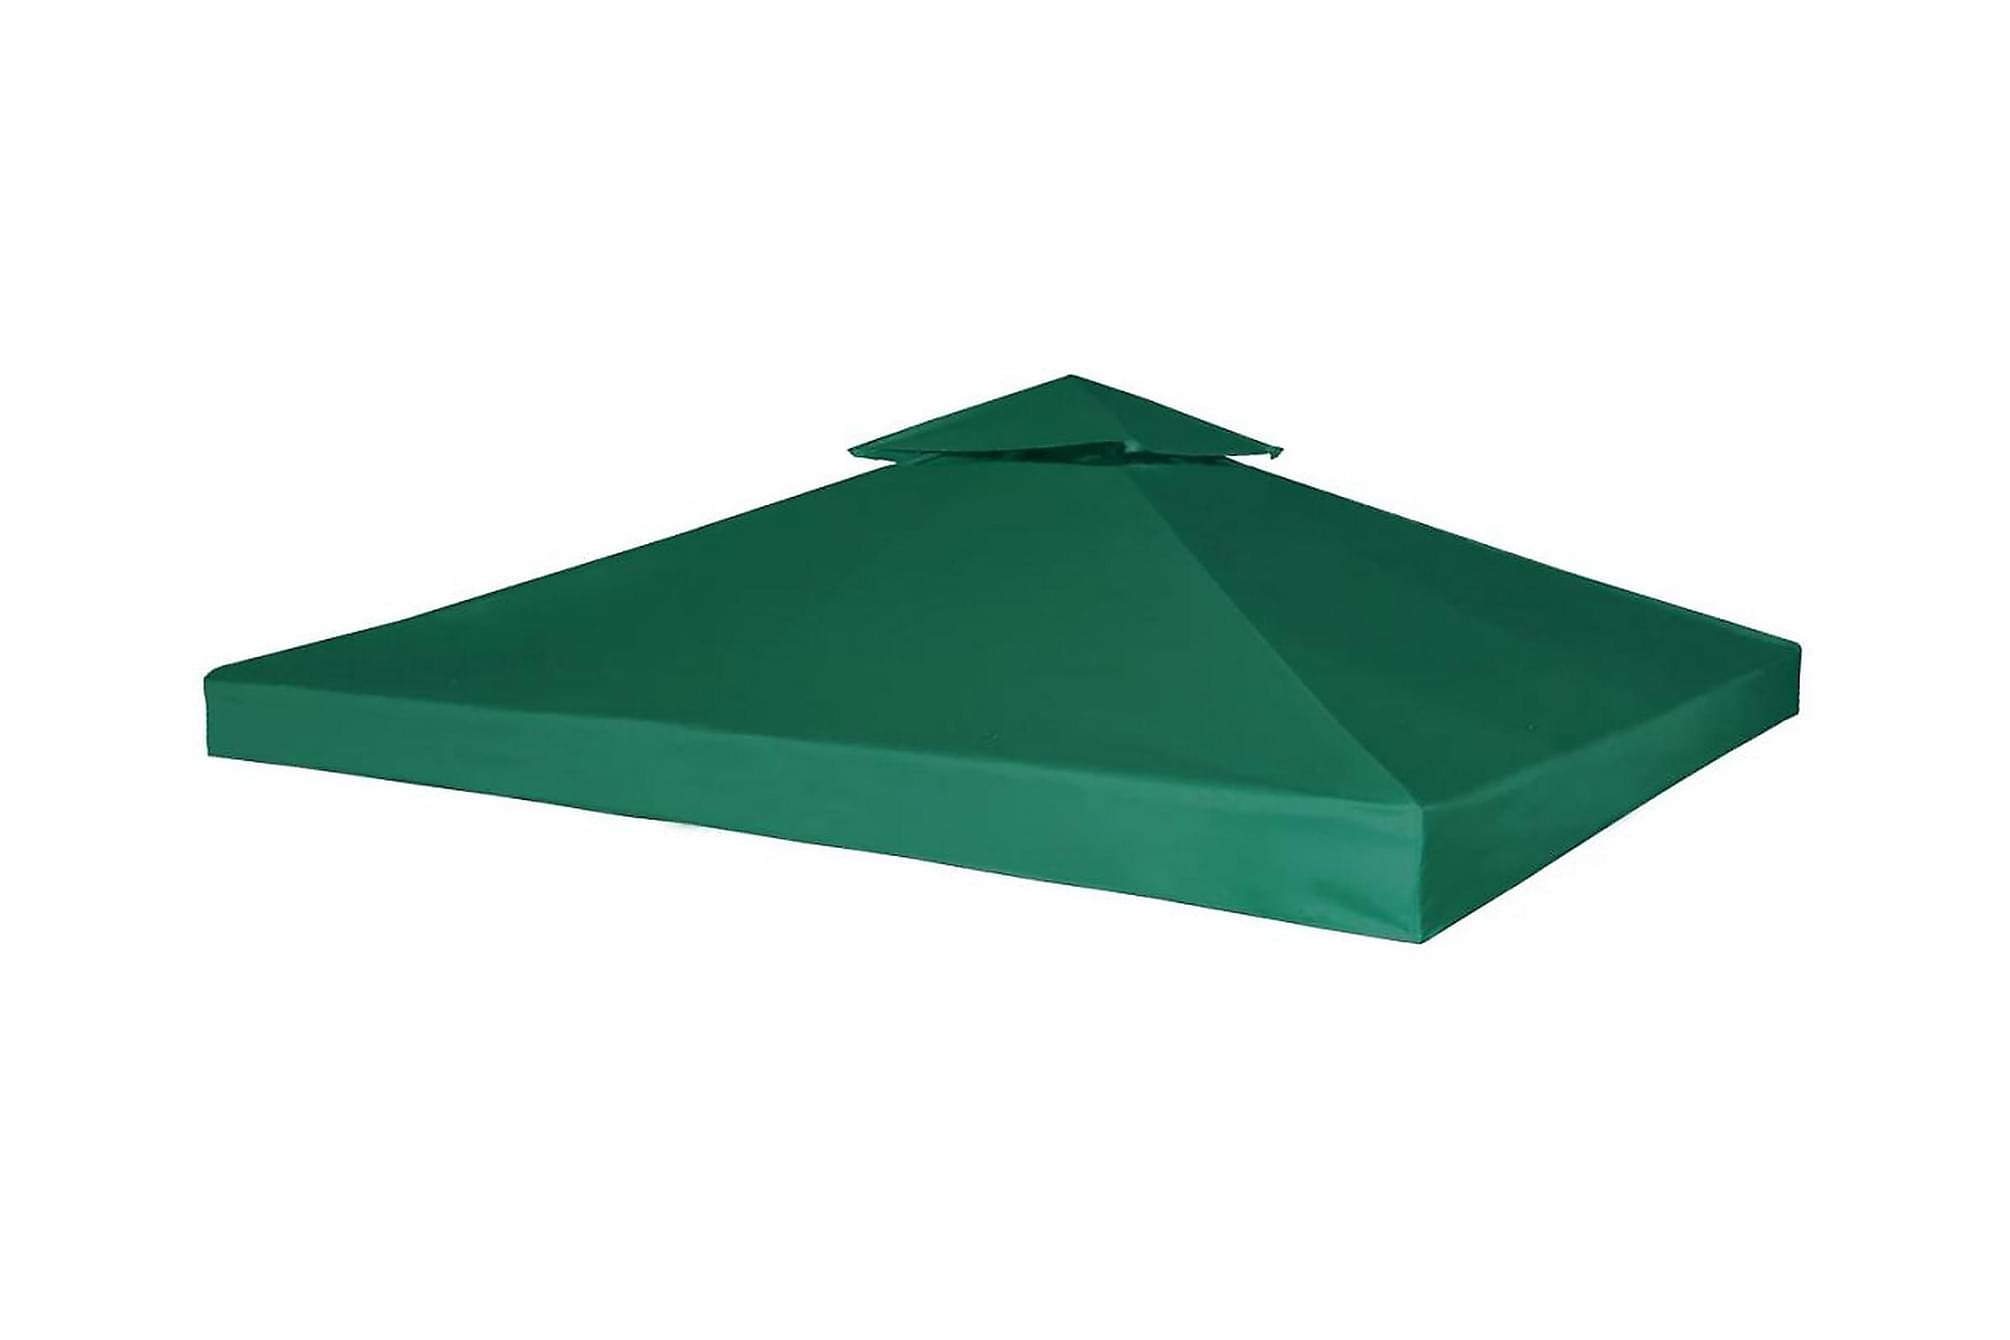 Paviljongtak 310 g/m2 3 x 3 m grön